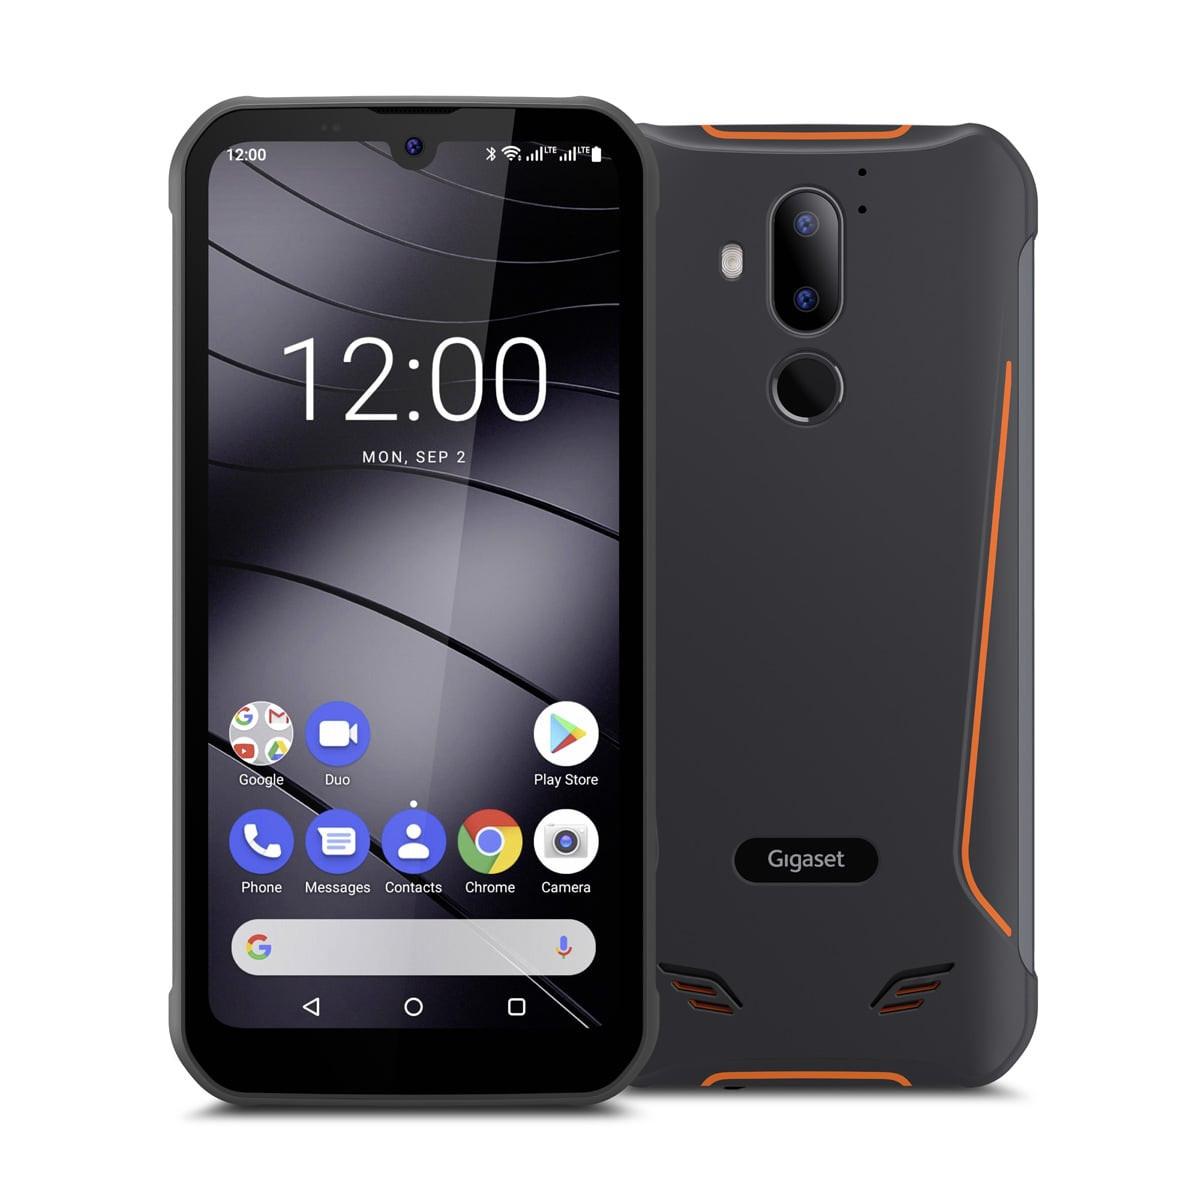 smartfon Gigaset GX290 smartphone